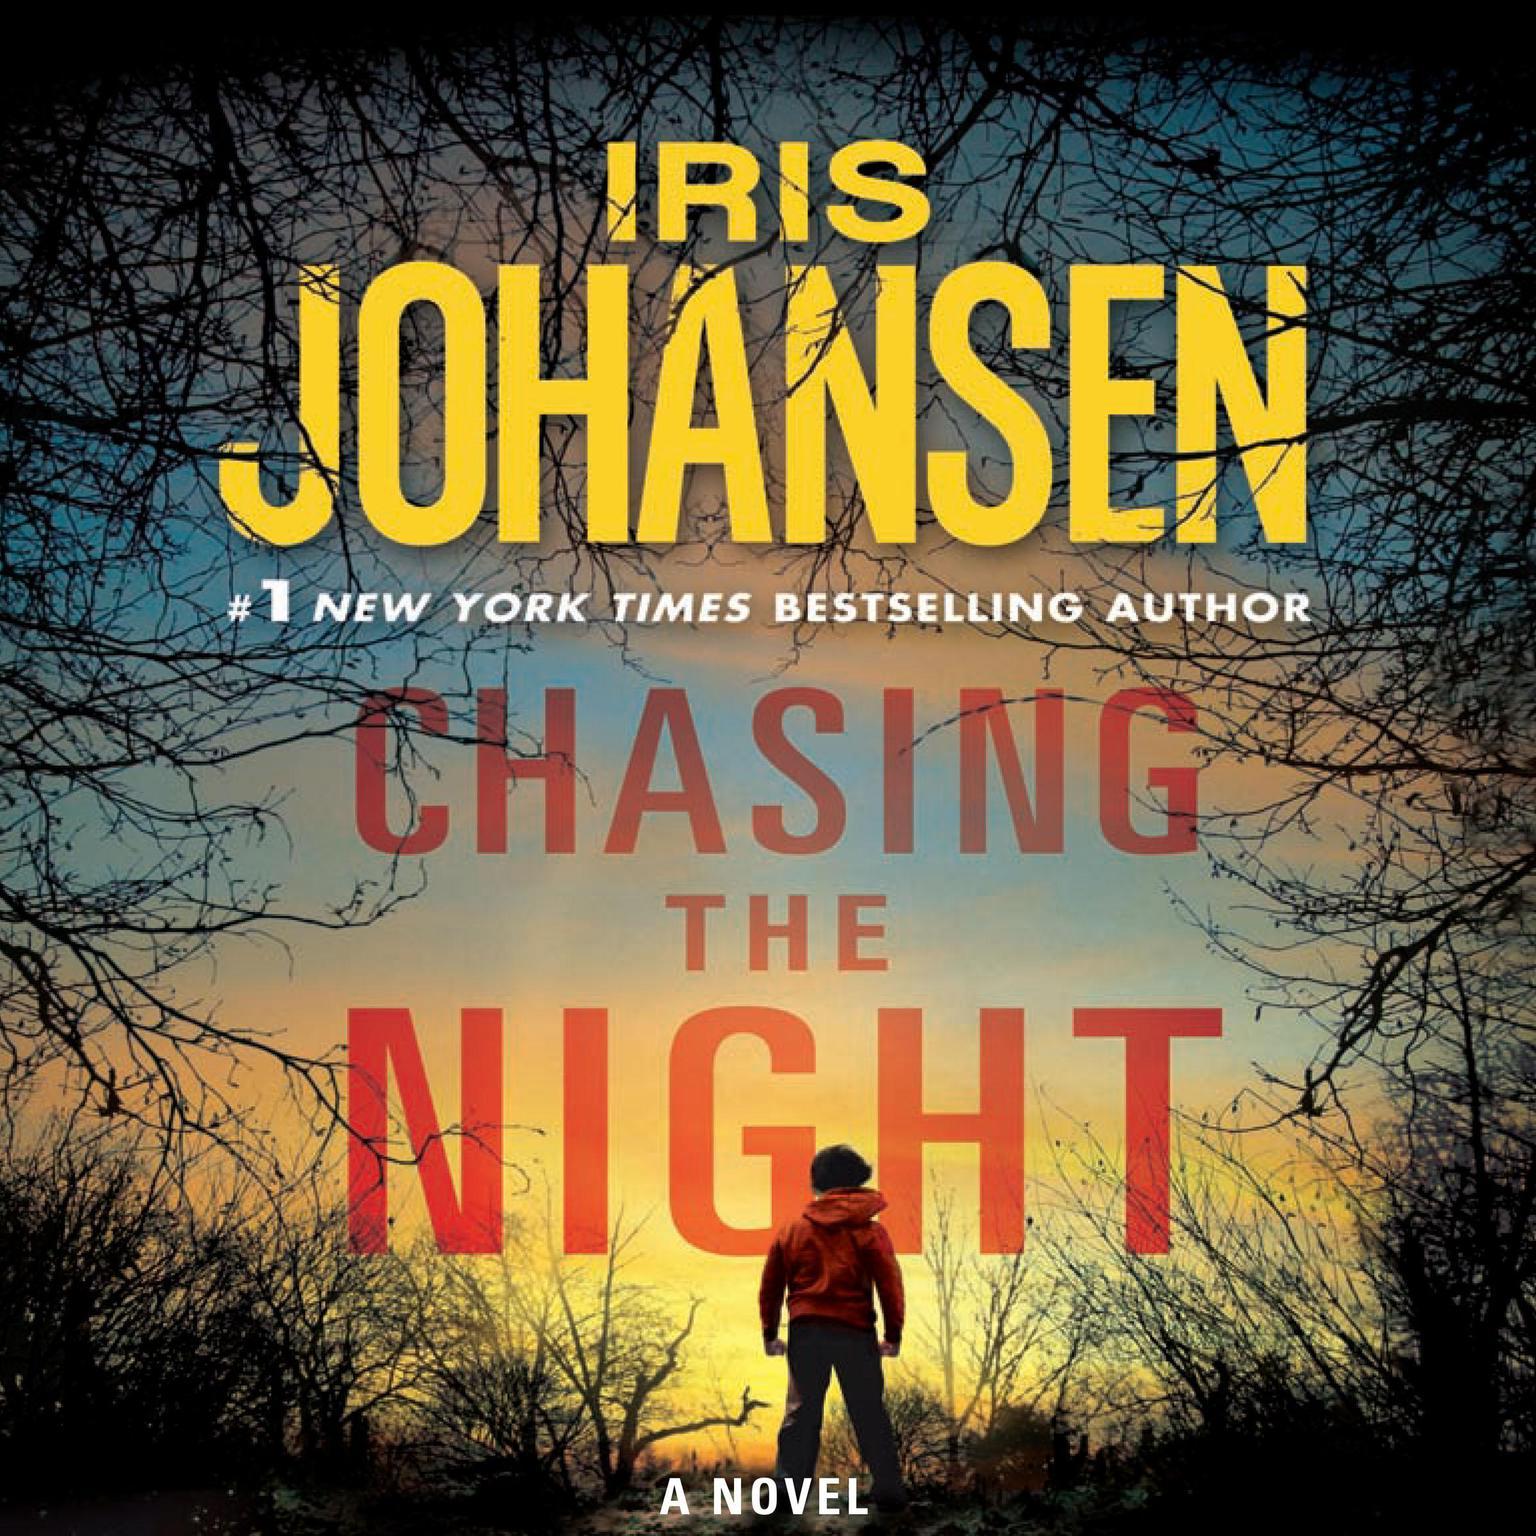 Chasing the Night (Abridged) Audiobook, by Iris Johansen